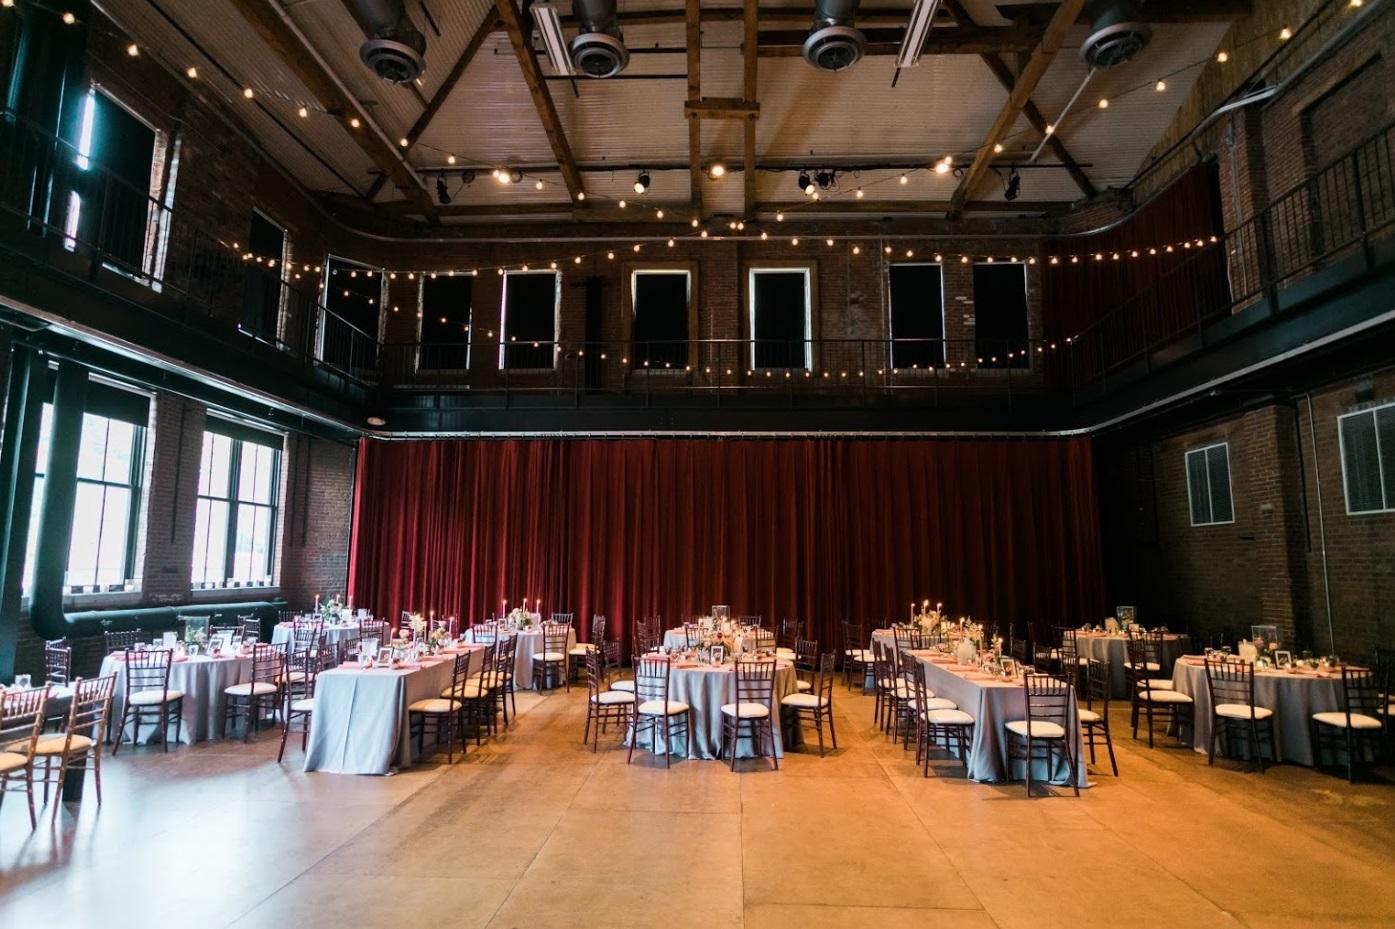 Pittsburgh Opera House_Nicole Englert80.jpg